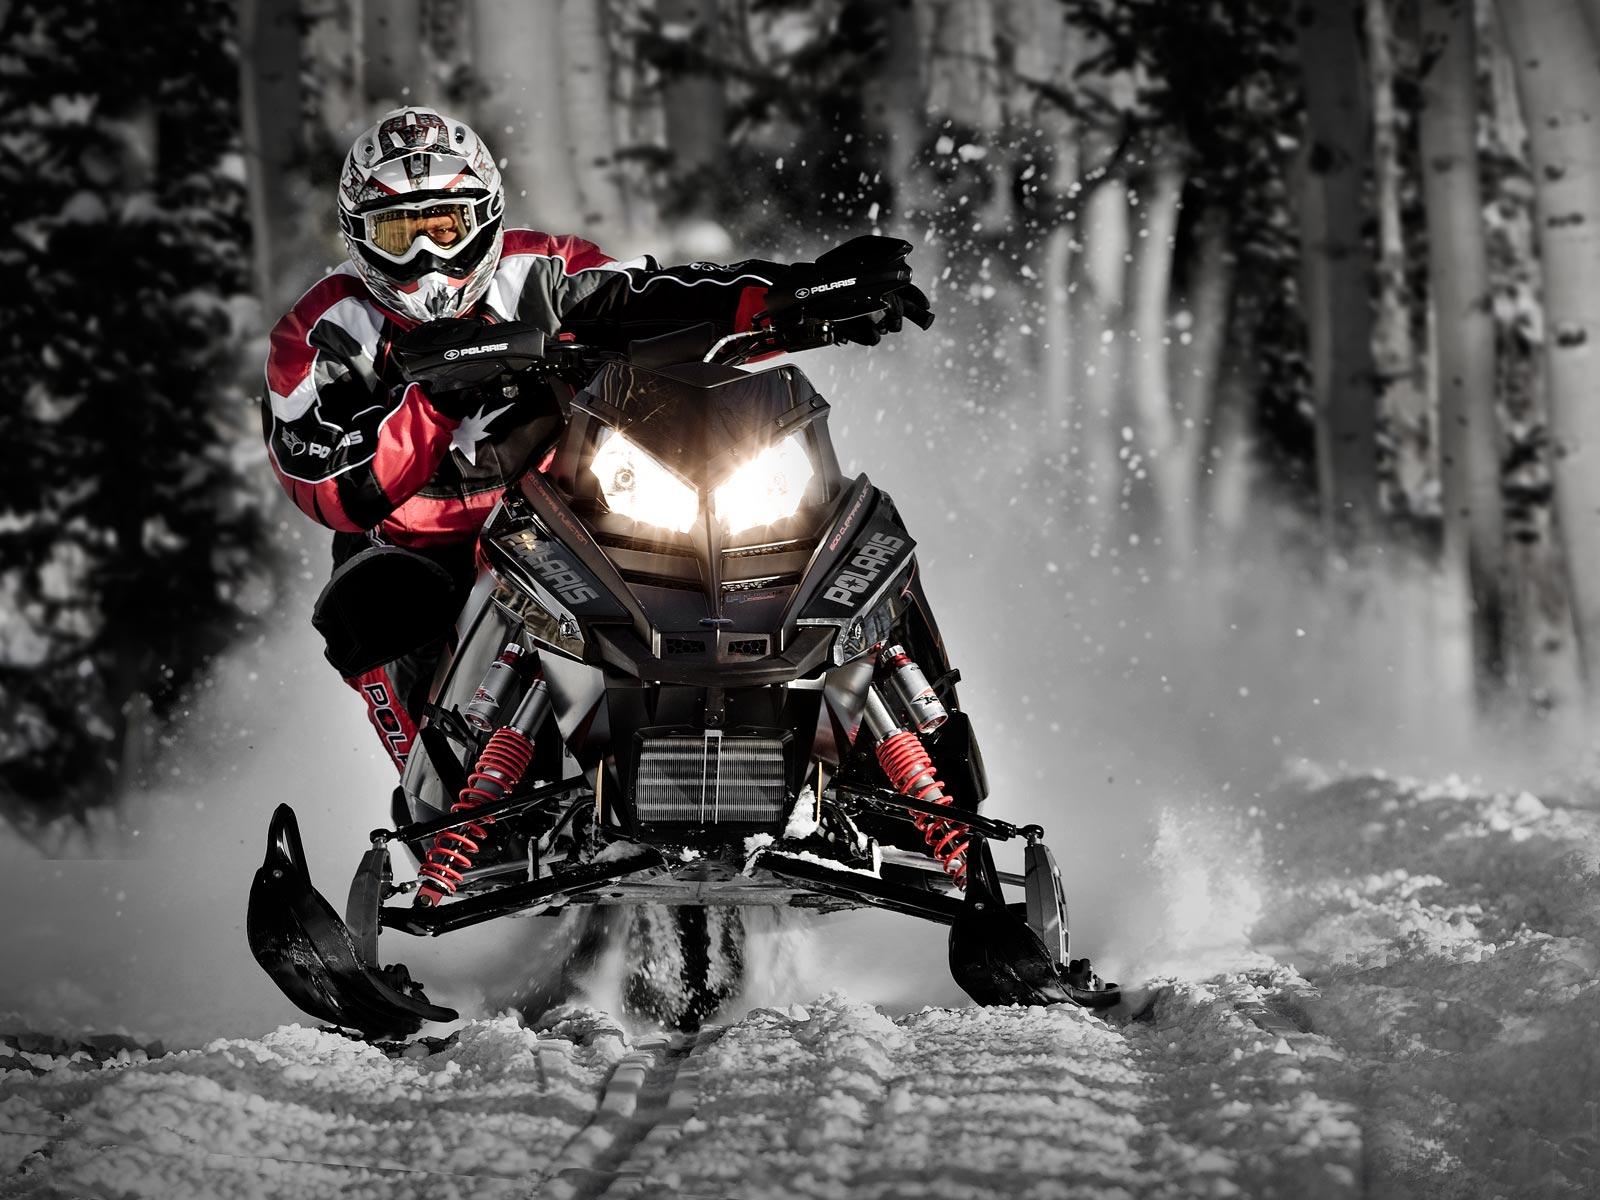 Best Yamaha Snowmobile